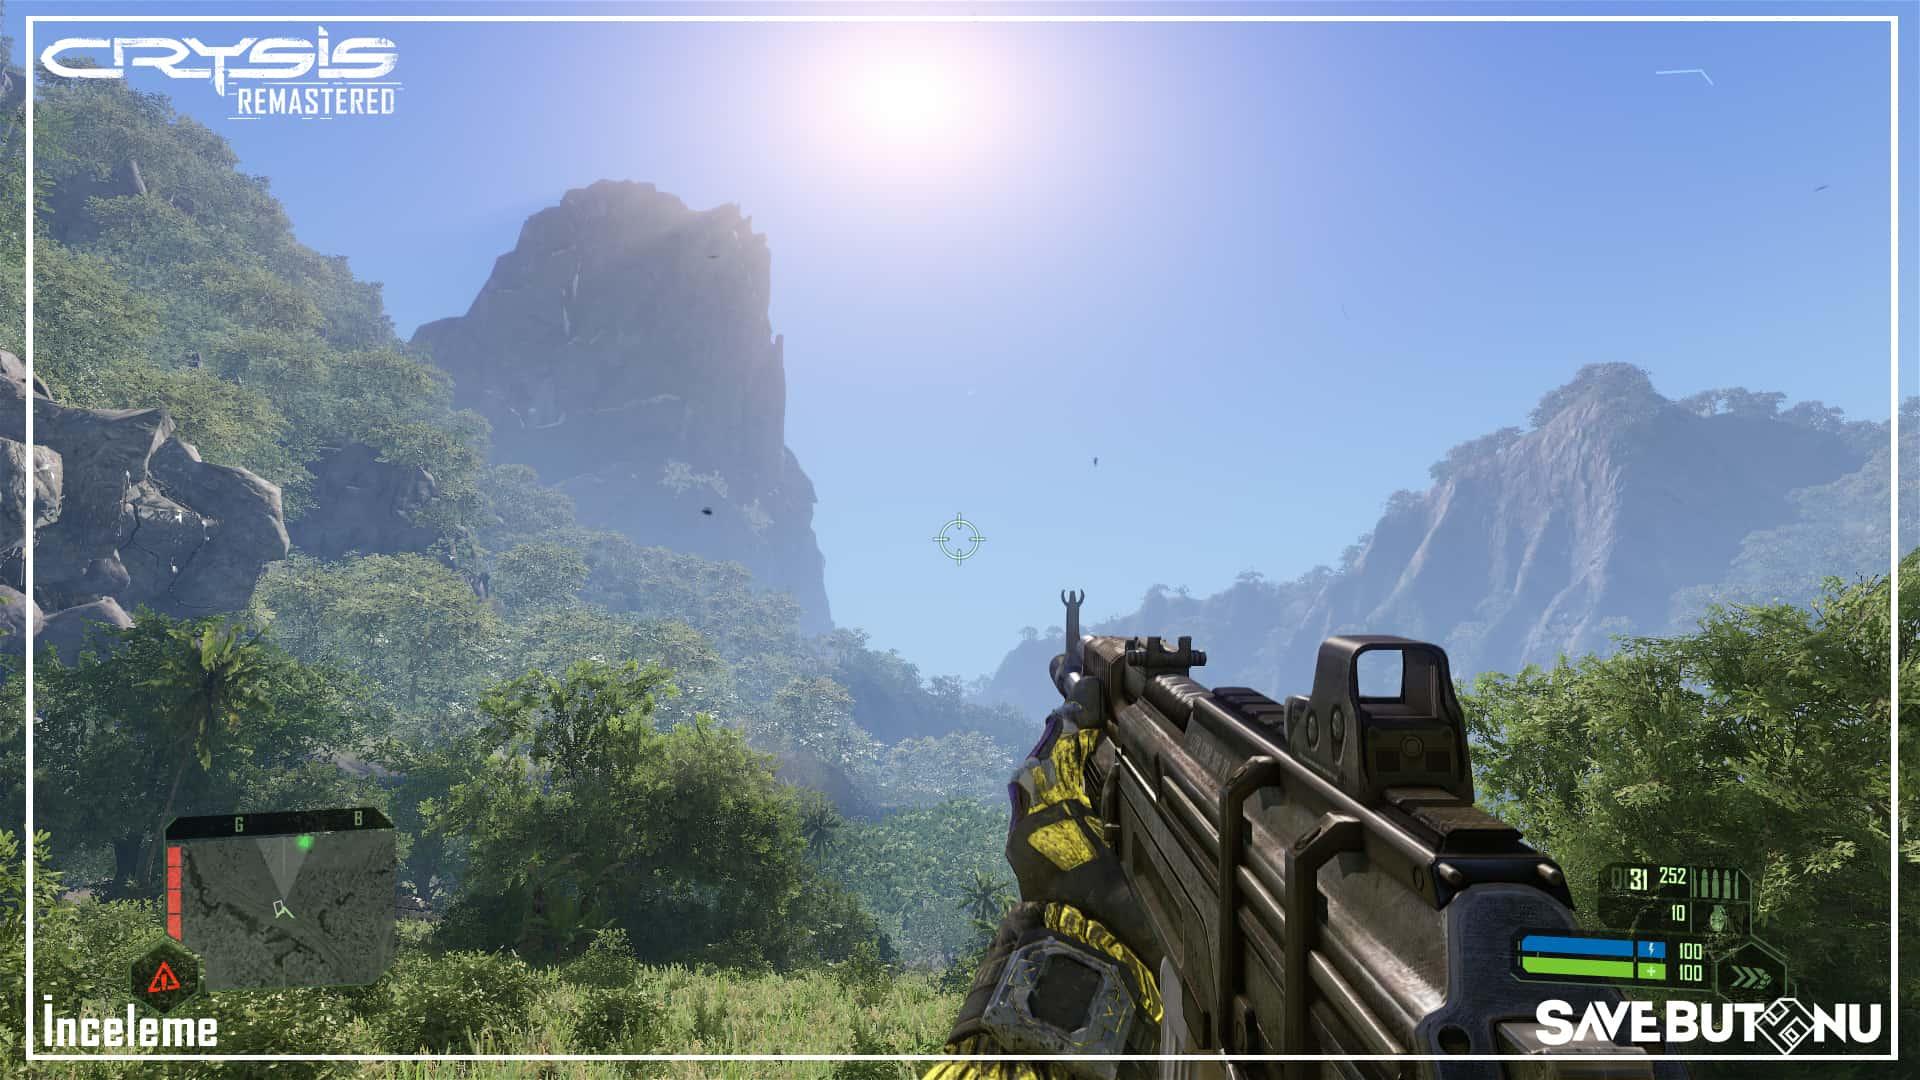 Crysis Remastered PC inceleme